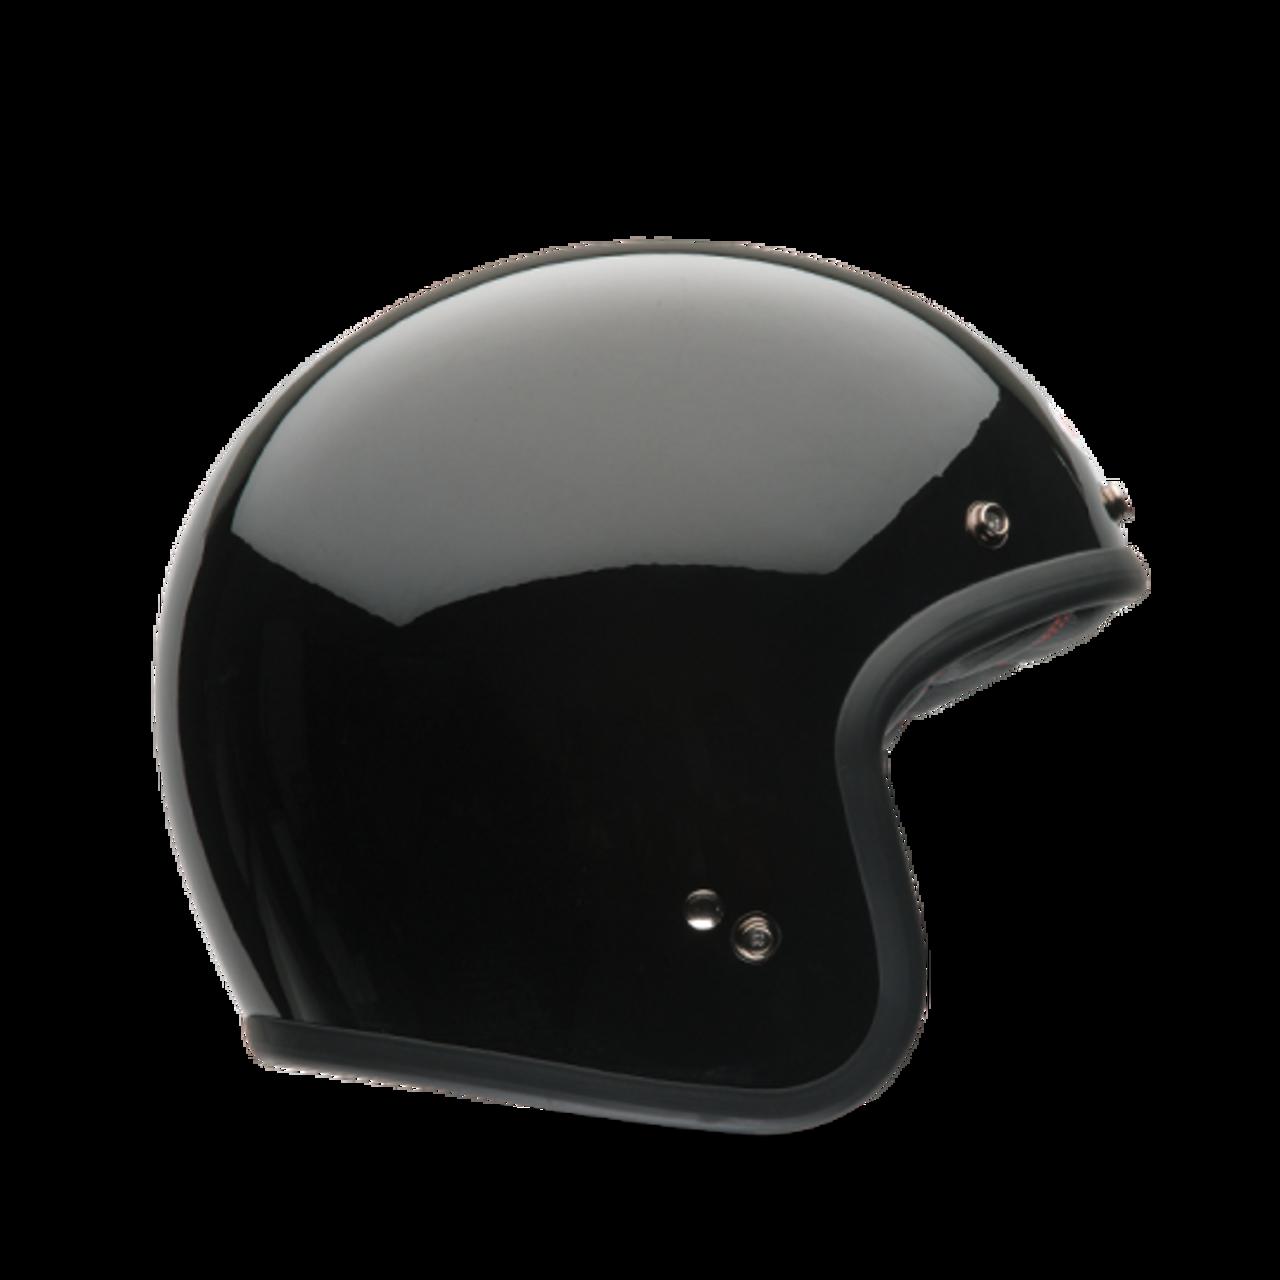 CLEARANCE SALEBell Custom 500 Motorcycle Helmet EU520 3 Snap Visor Black